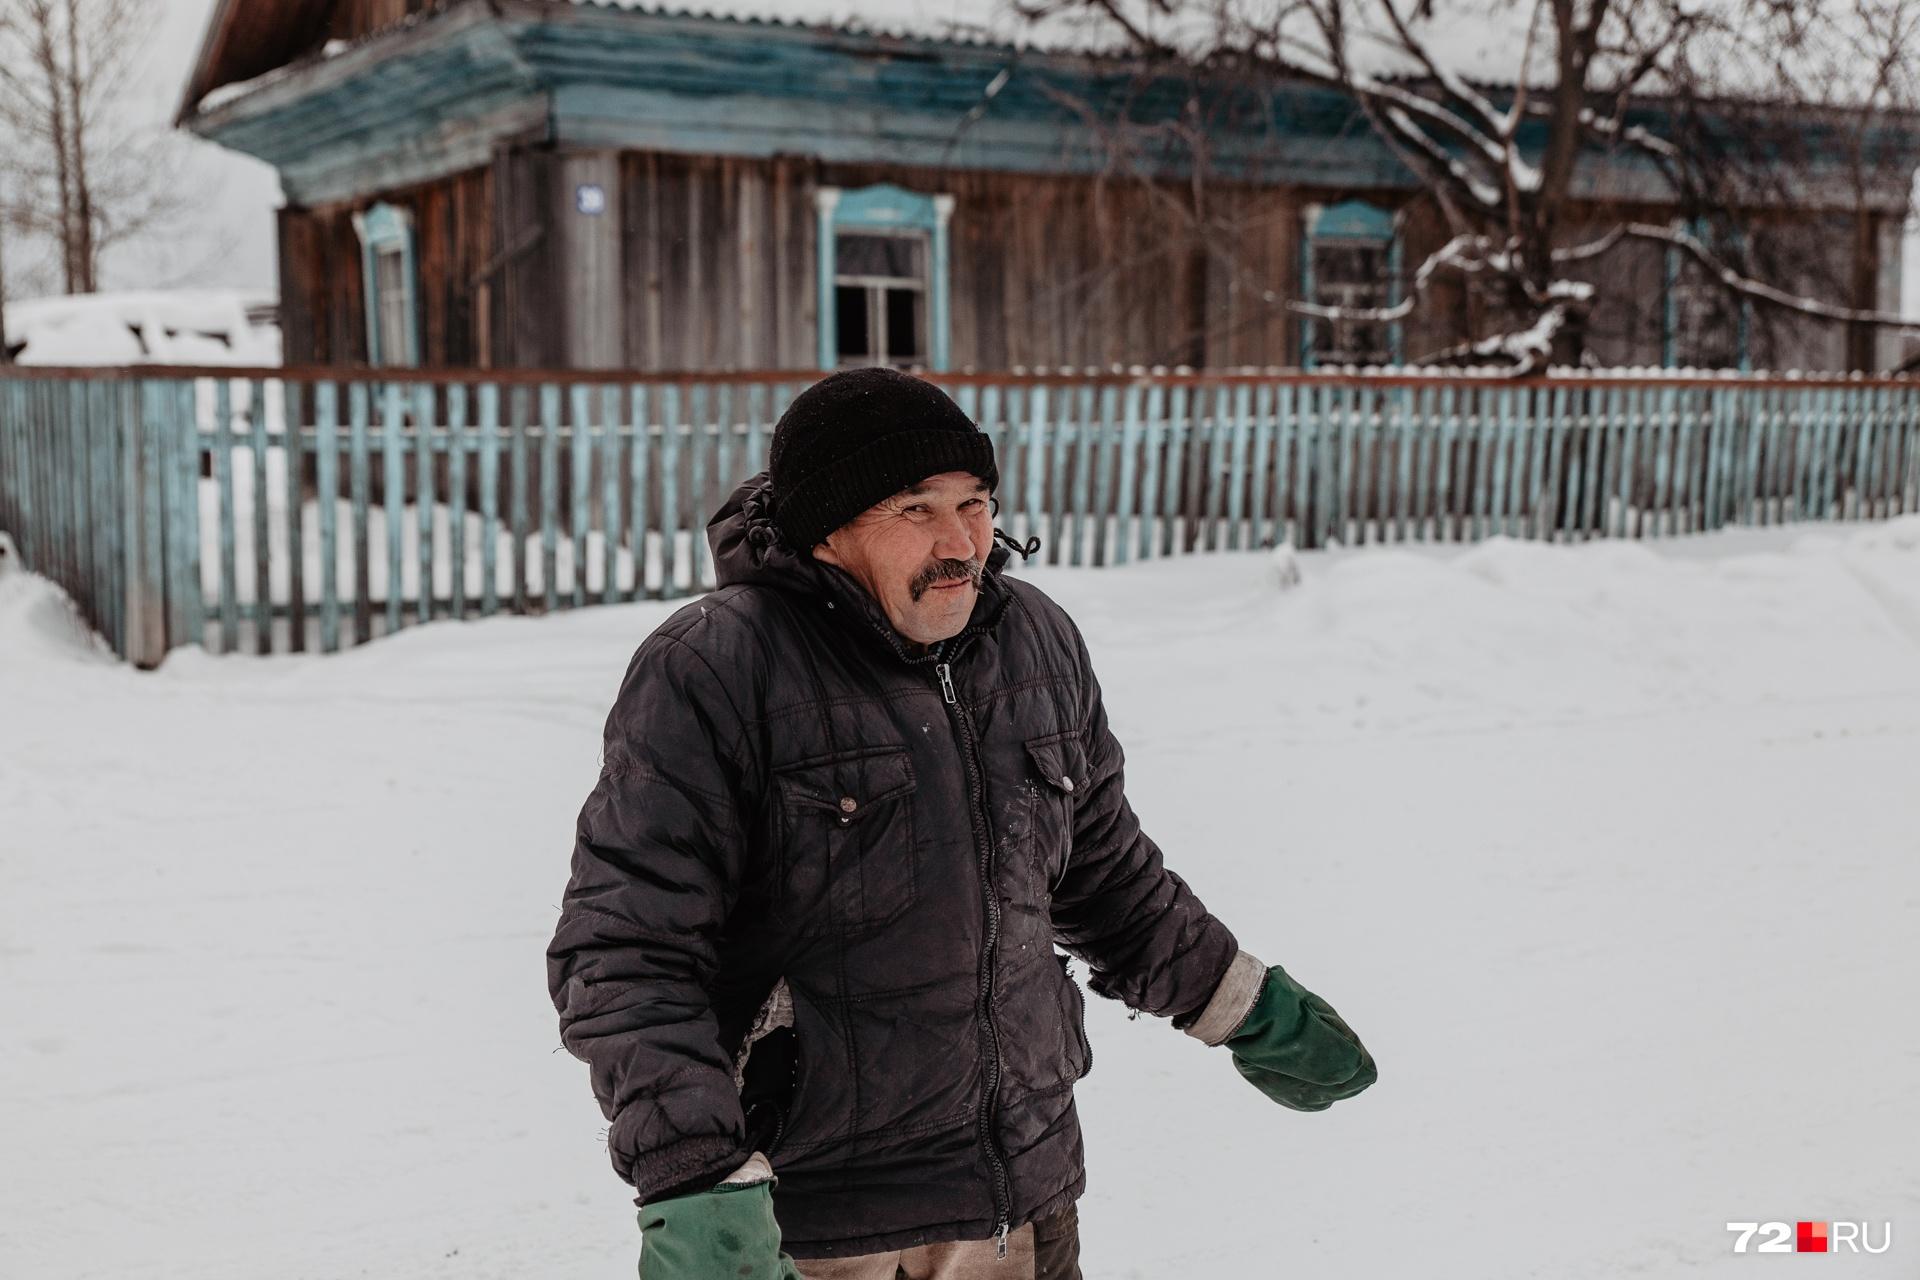 Рябикову 56 лет. Живет он один